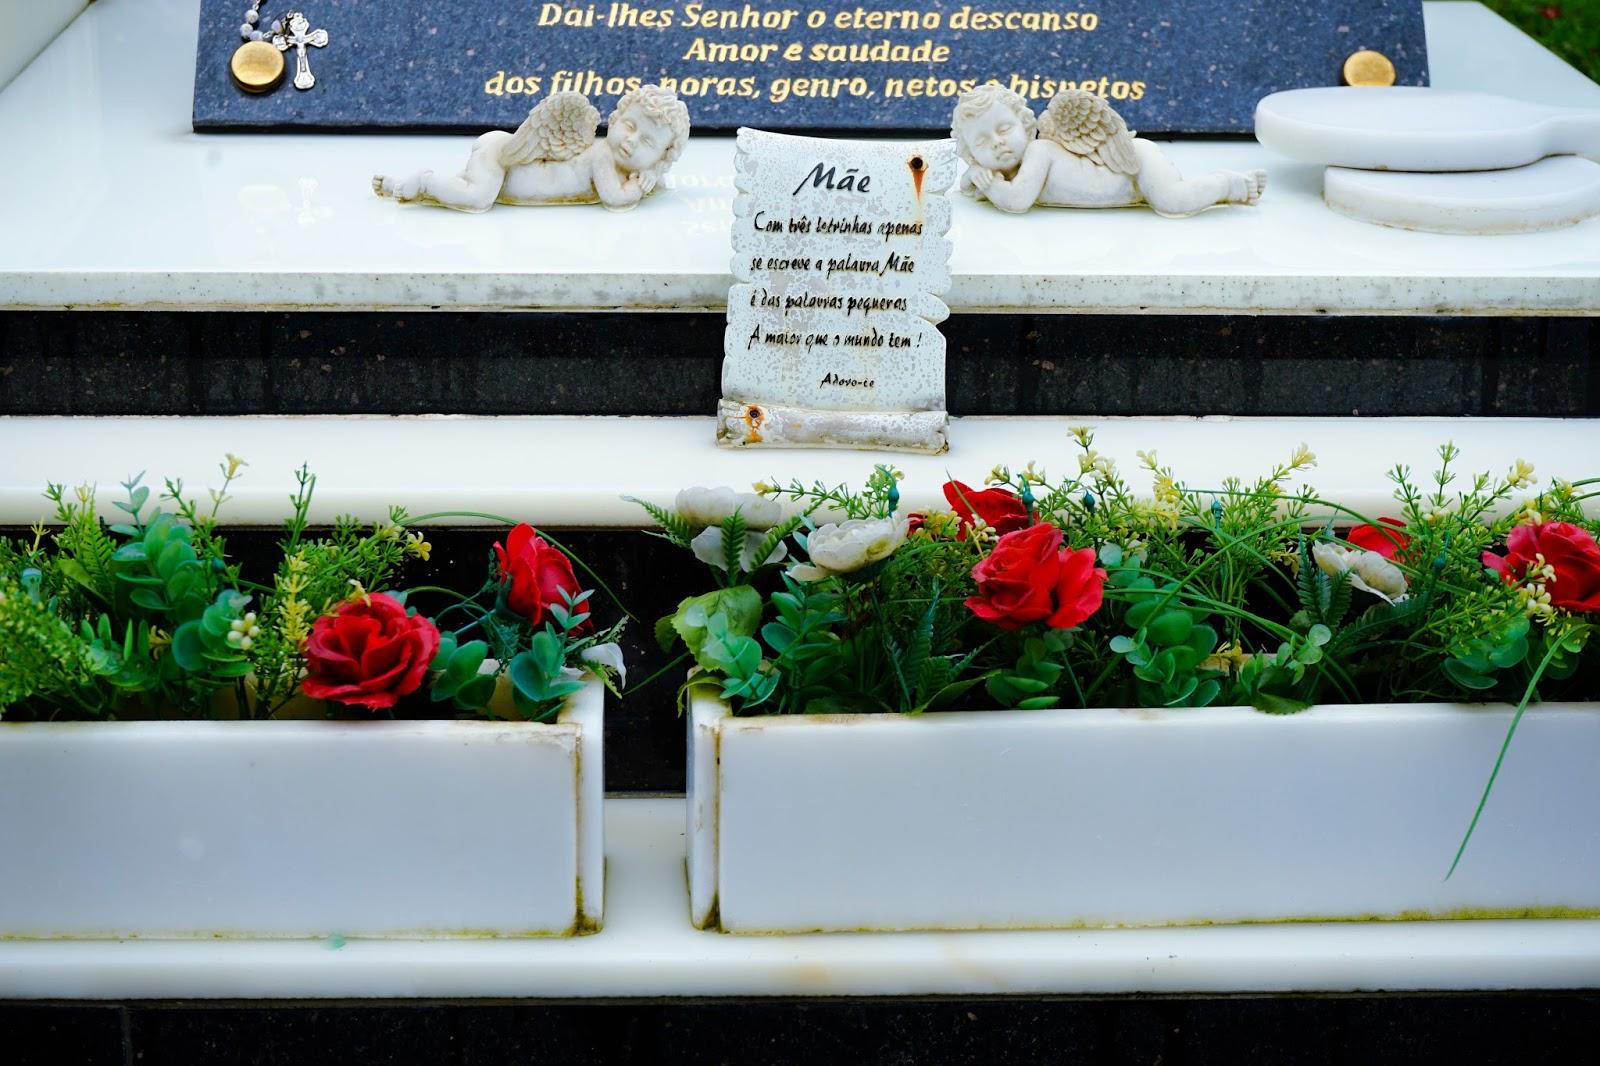 beautyanxiety.com-St. Michael's Chapel and Cemetery-beautyanxiety.com-St.%2BMichael%2527s%2BChapel%2Band%2BCemetery-DSC09857.jpg